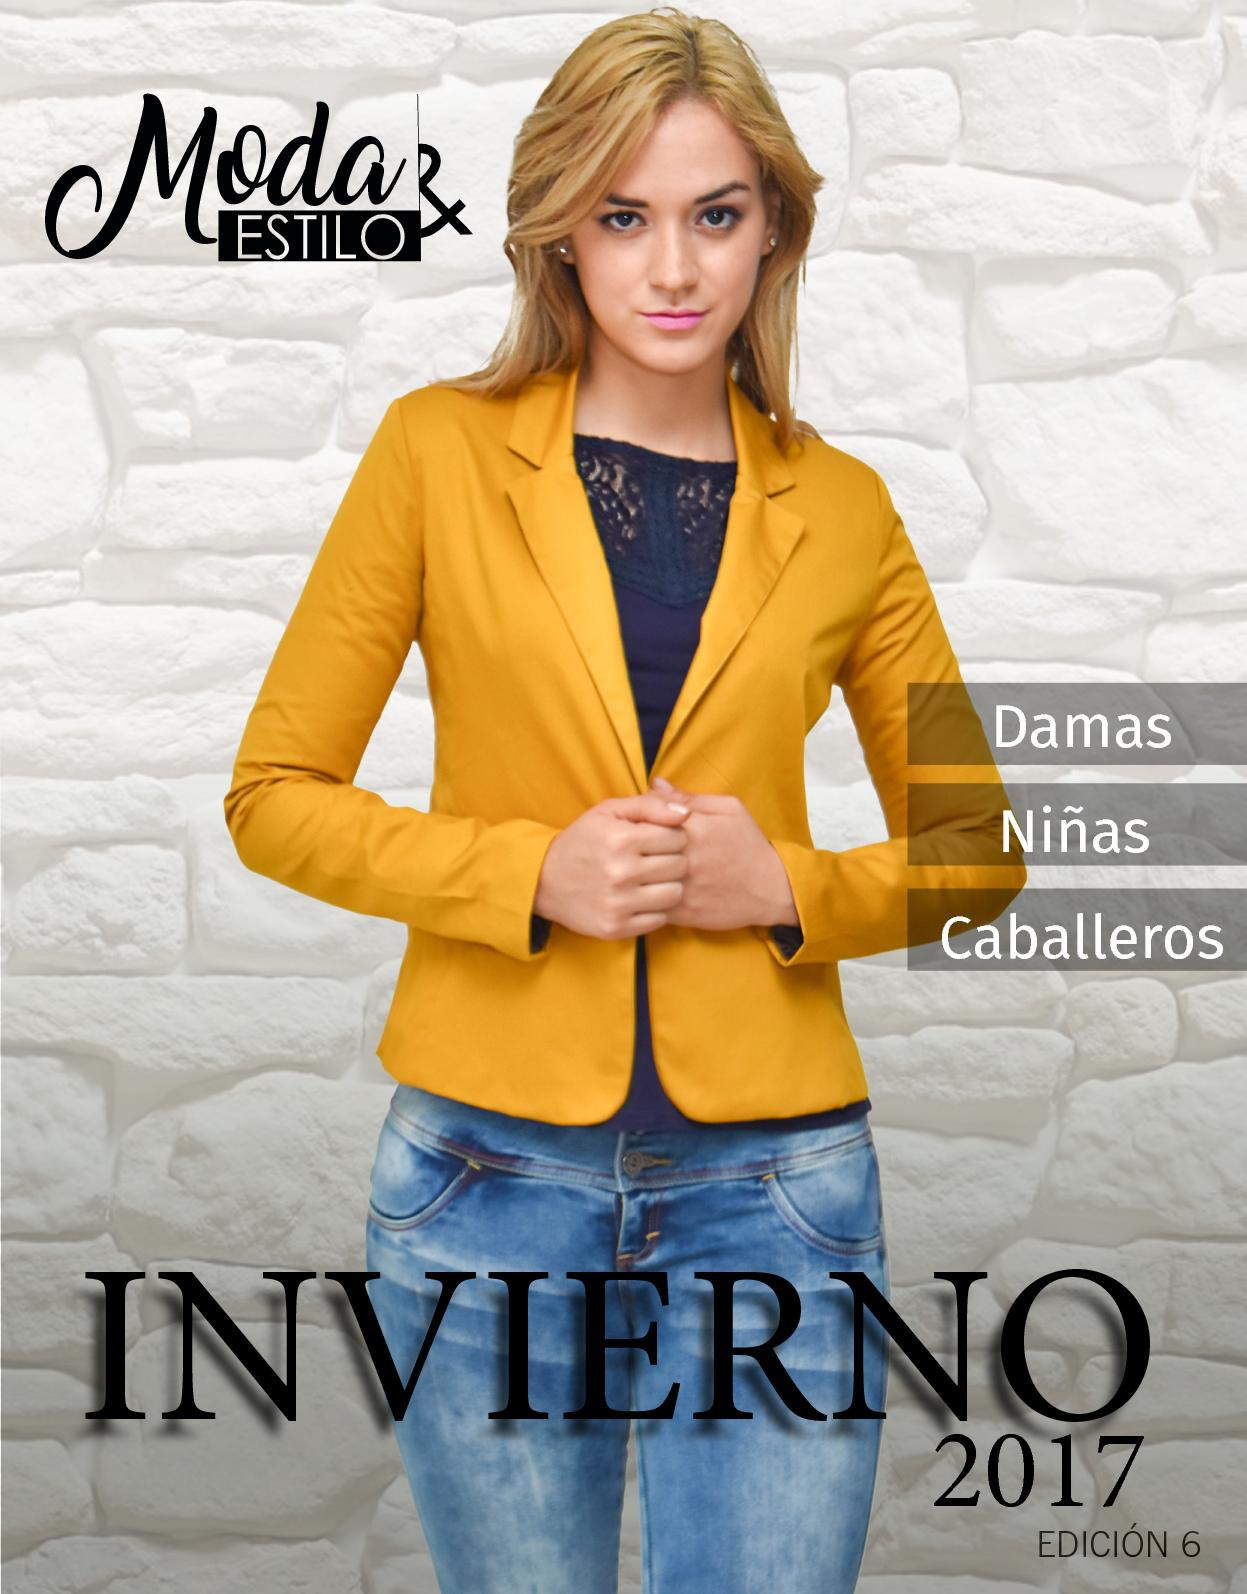 Catalogo 2017 Invierno